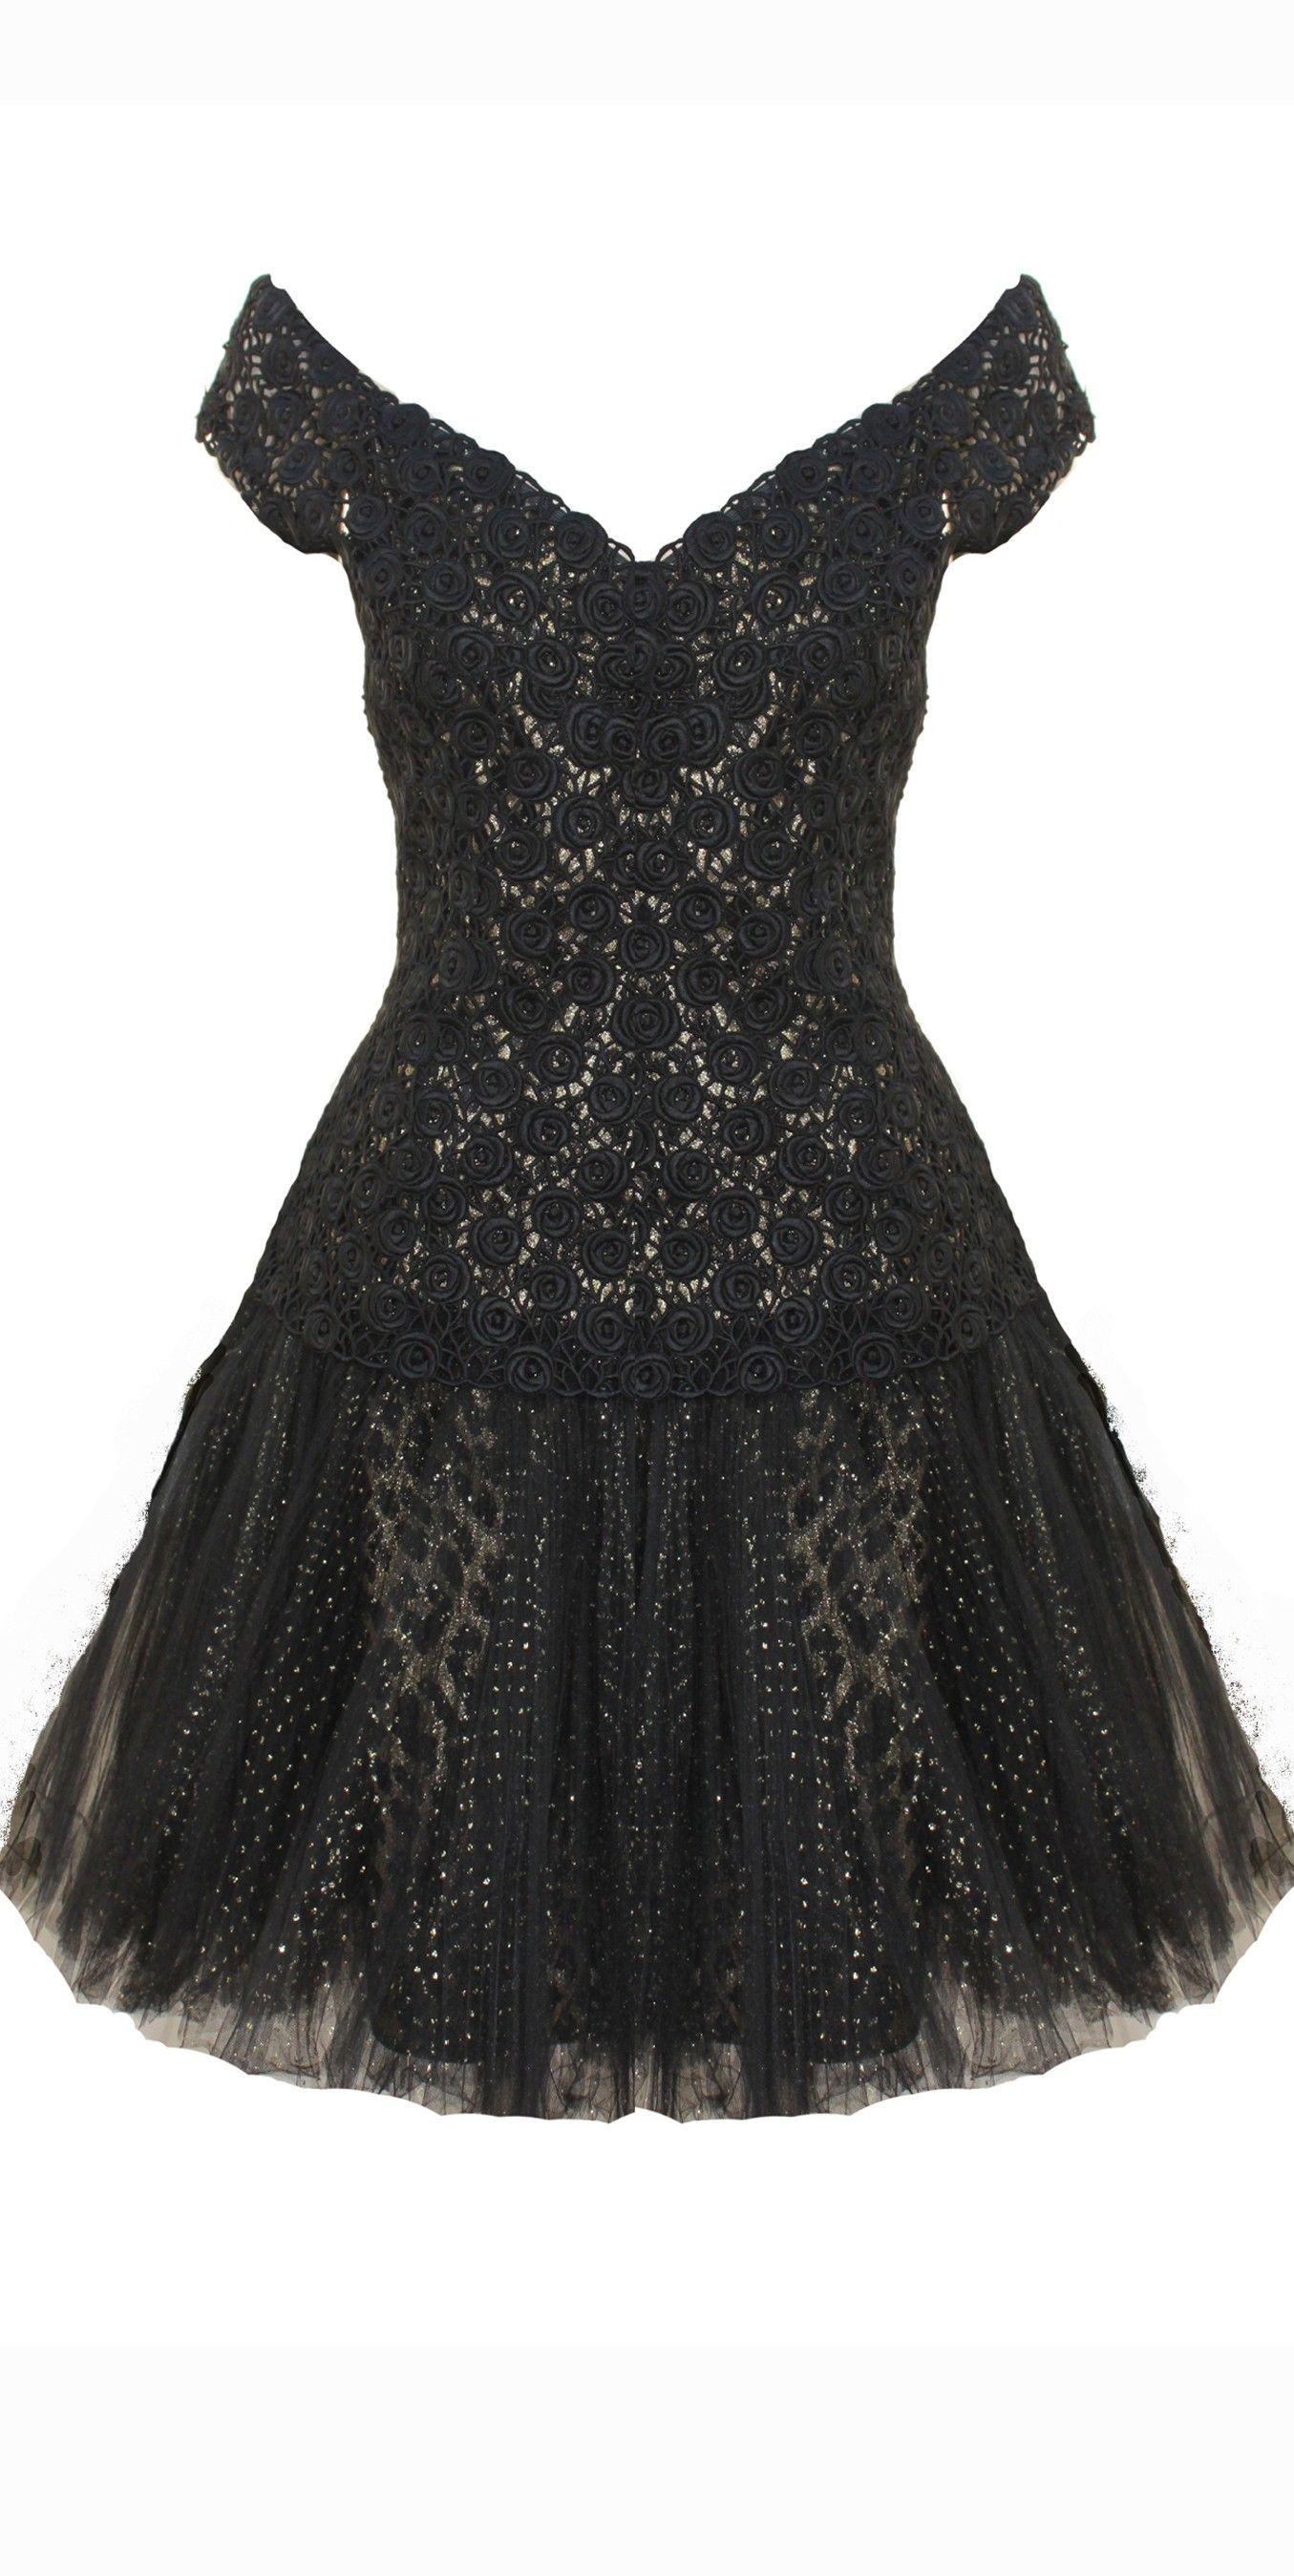 Vintage aline scallopededge kneelength s lace black prom